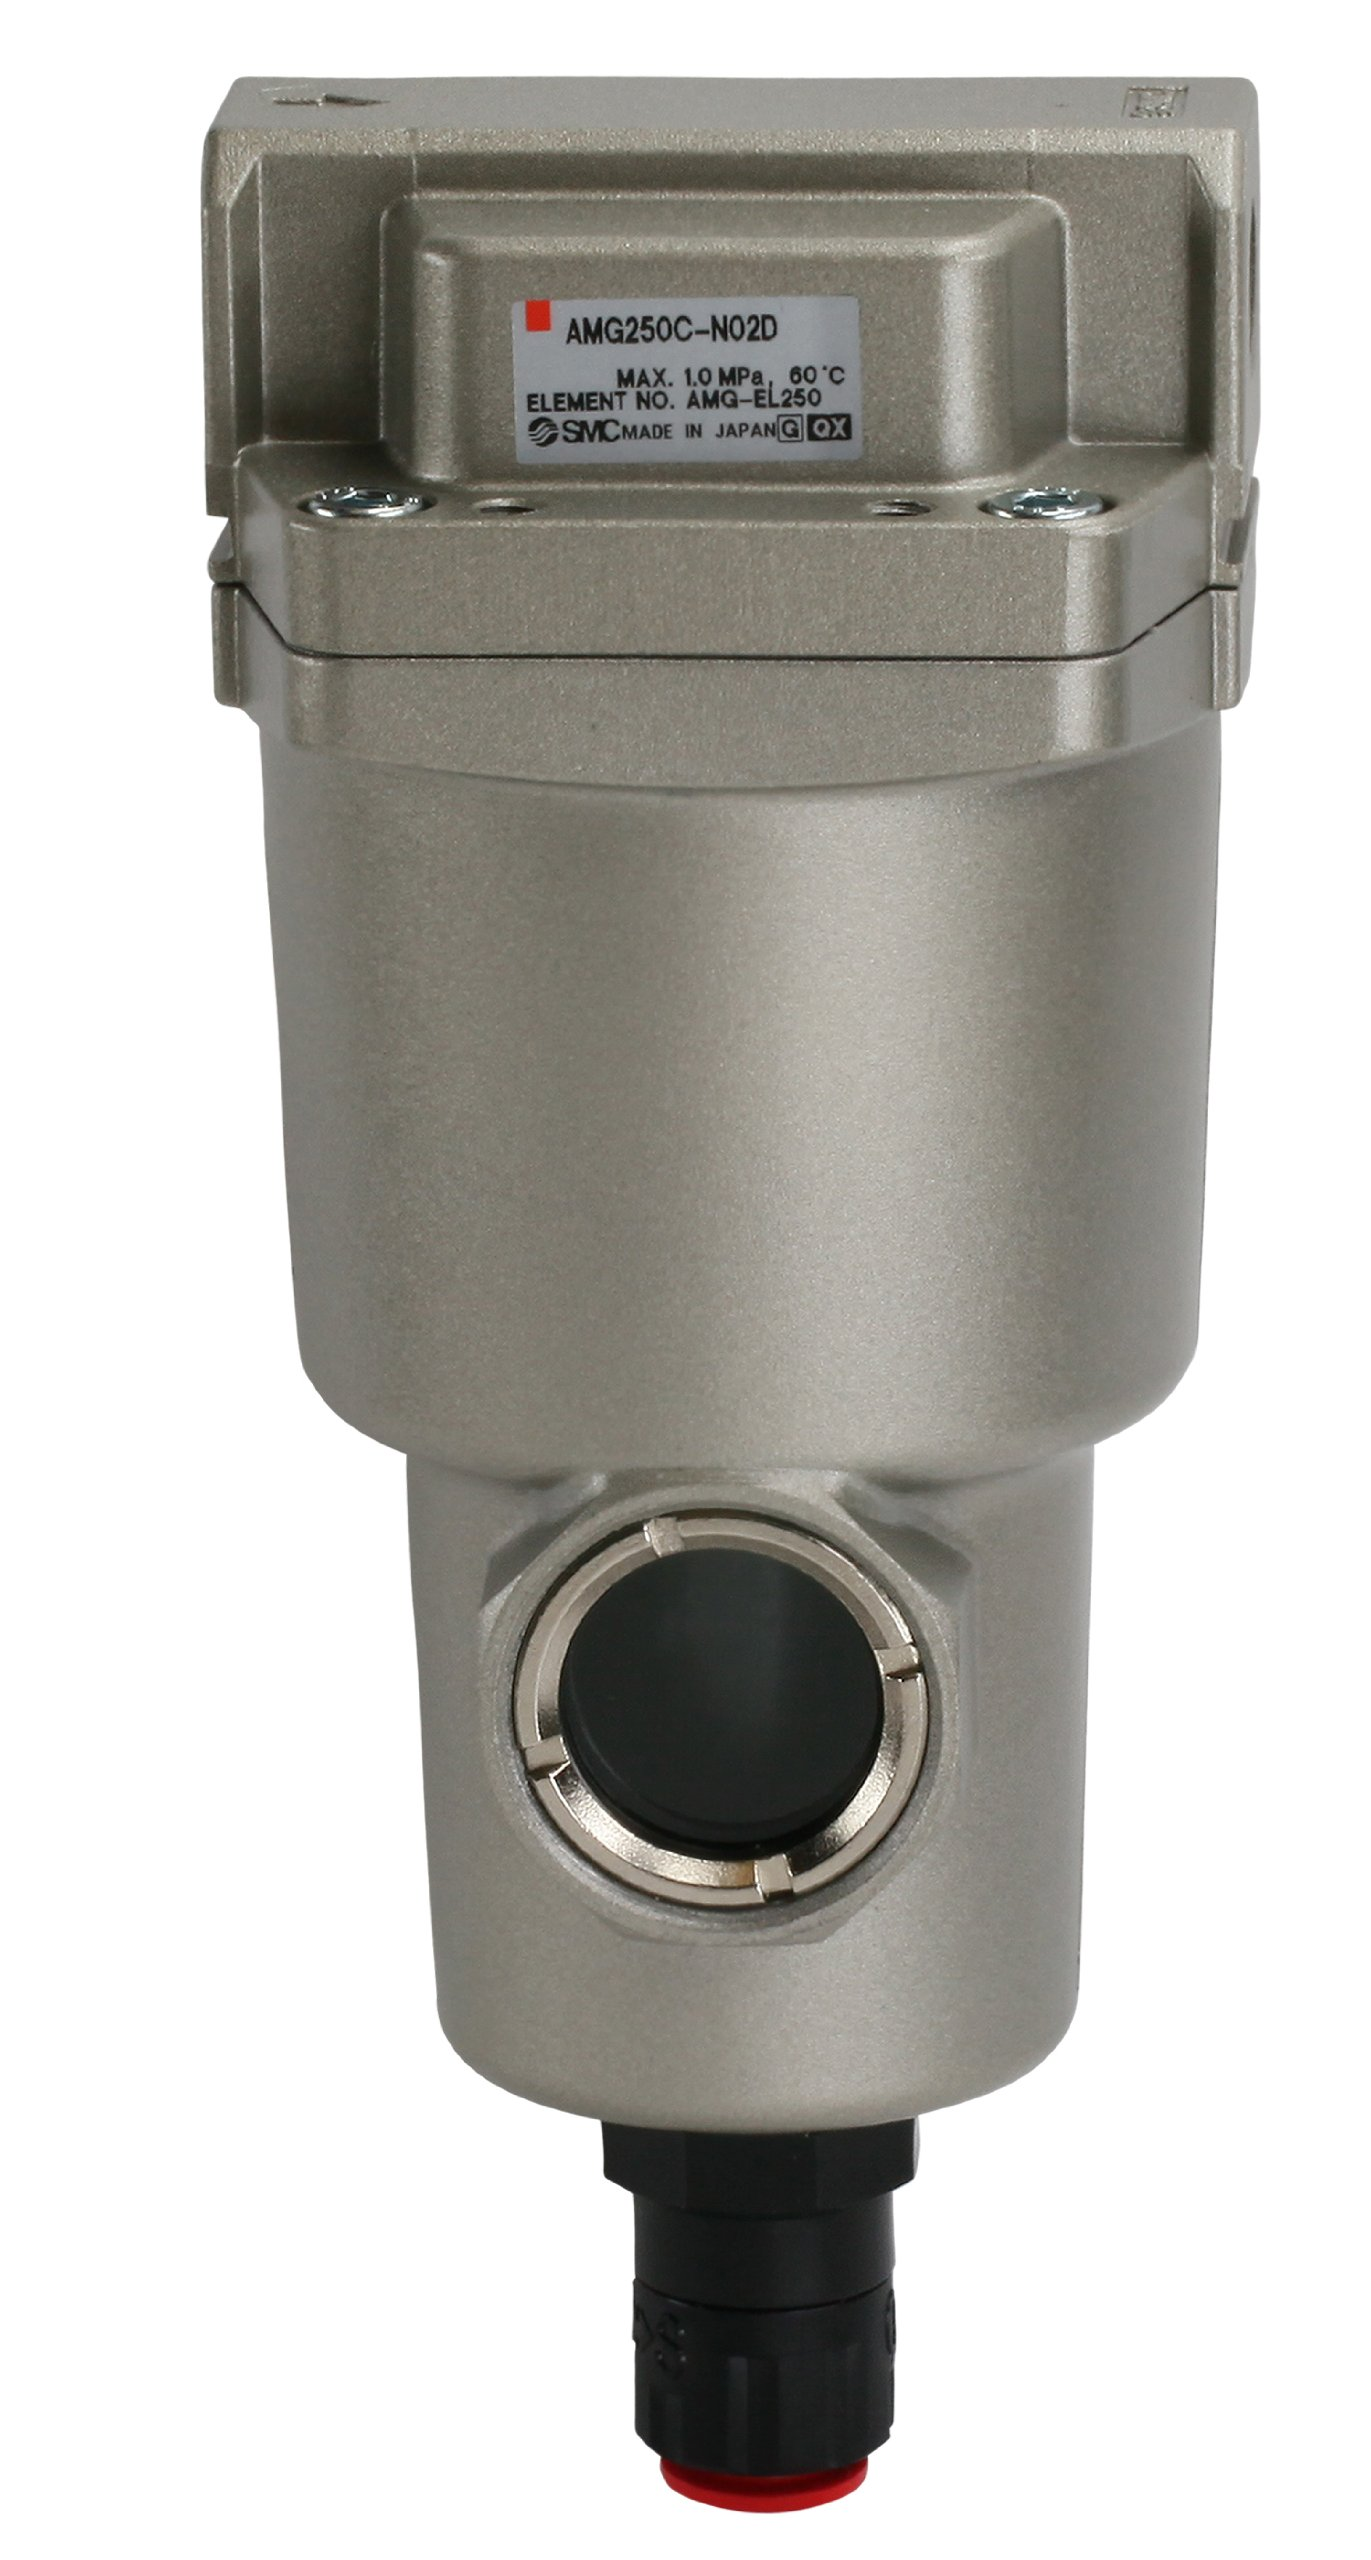 SMC AMG250C-N03D Water Separator, N.O. Auto Drain, 750 L/min, 3/8'' NPT by SMC